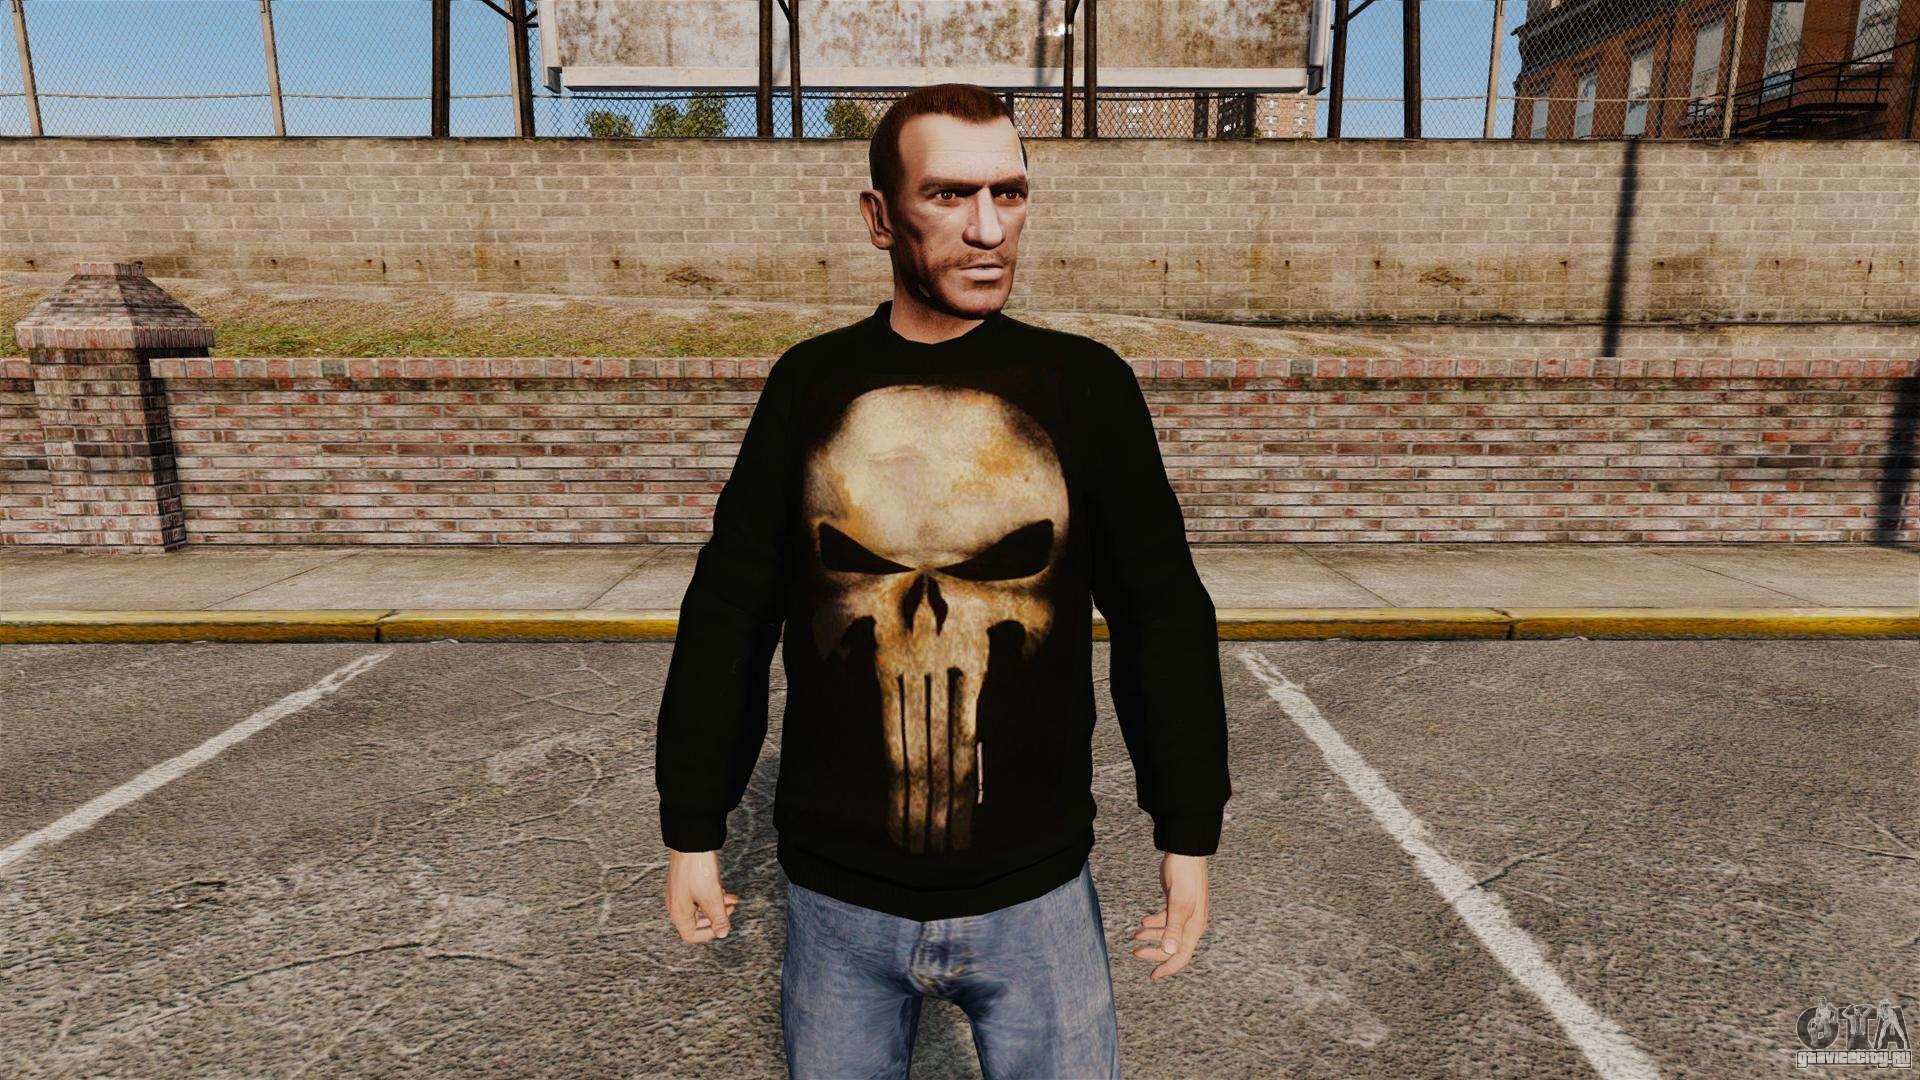 Игра Grand Theft Auto 4. Скины для GTA 4. Свитер -The Punisher- для GTA